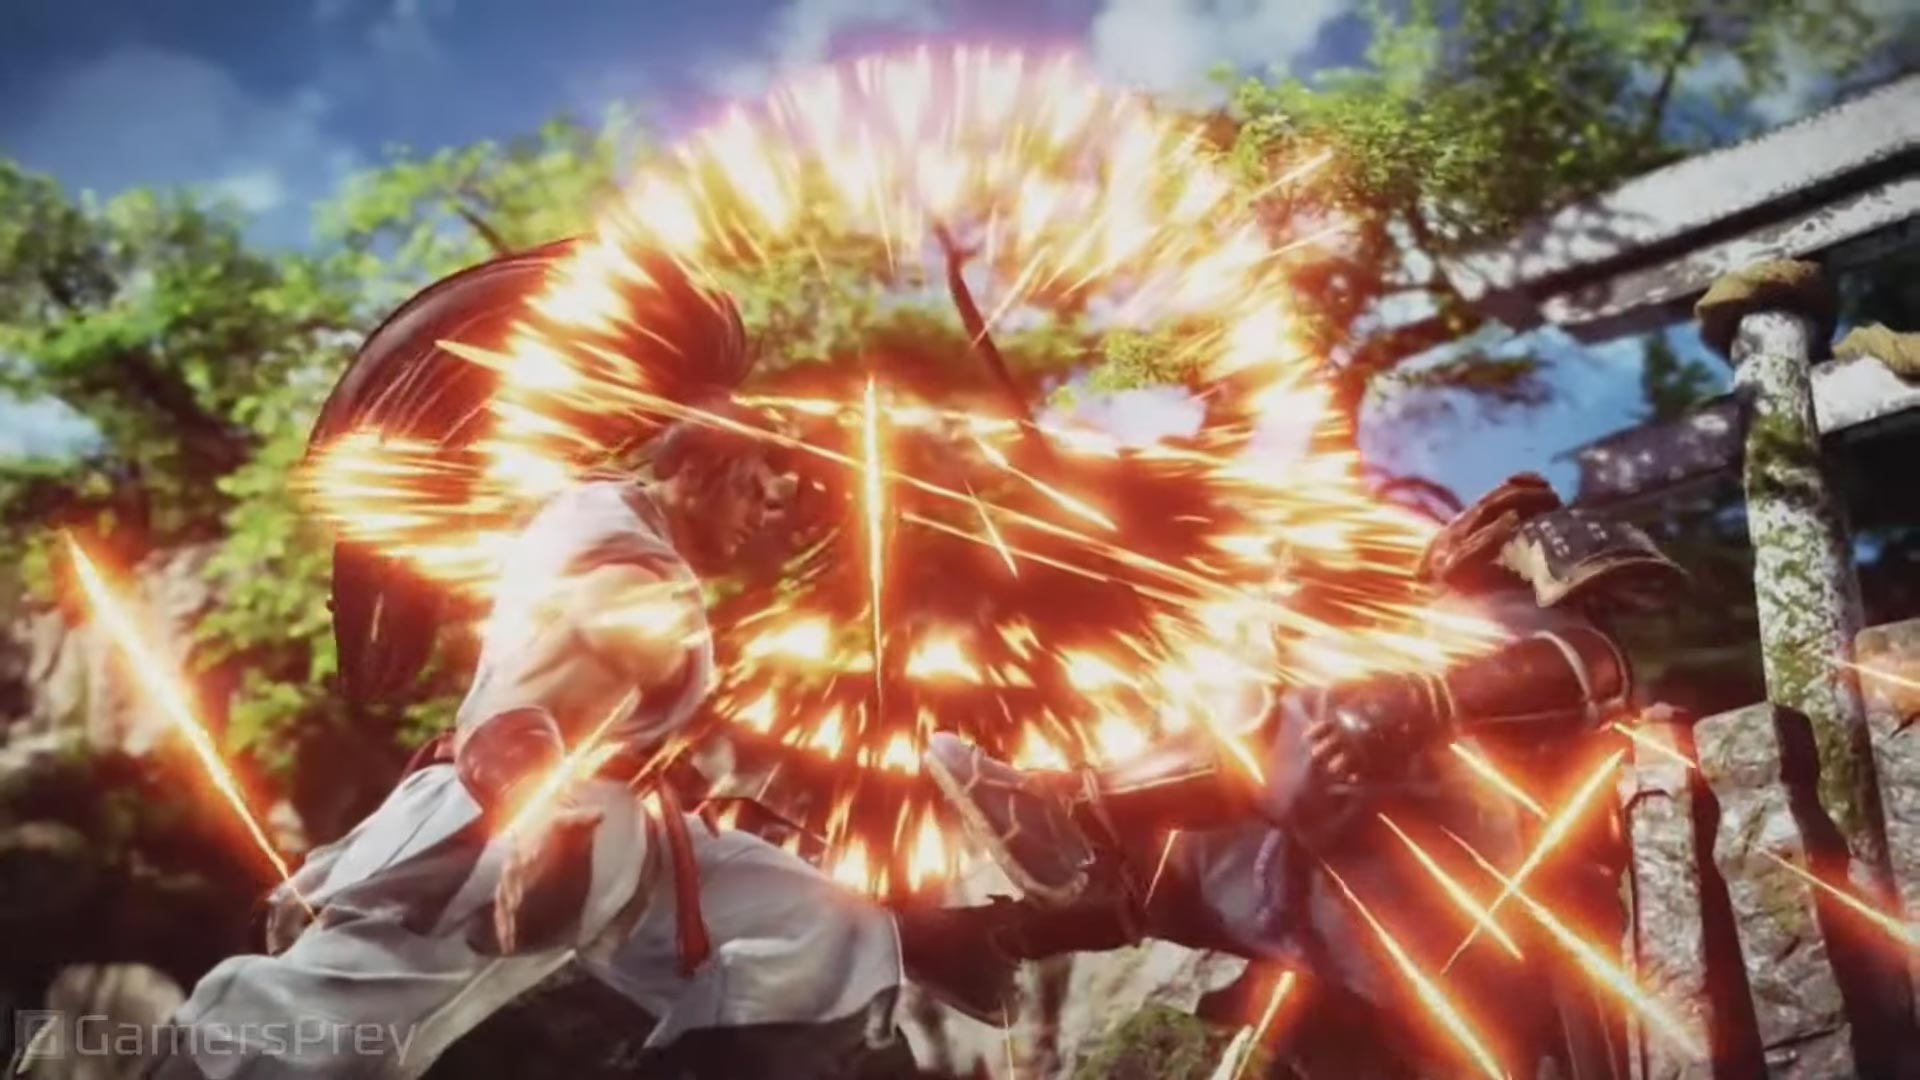 Soul Calibur 6 Haohmaru Trailer Screenshot Gallery 4 out of 6 image gallery